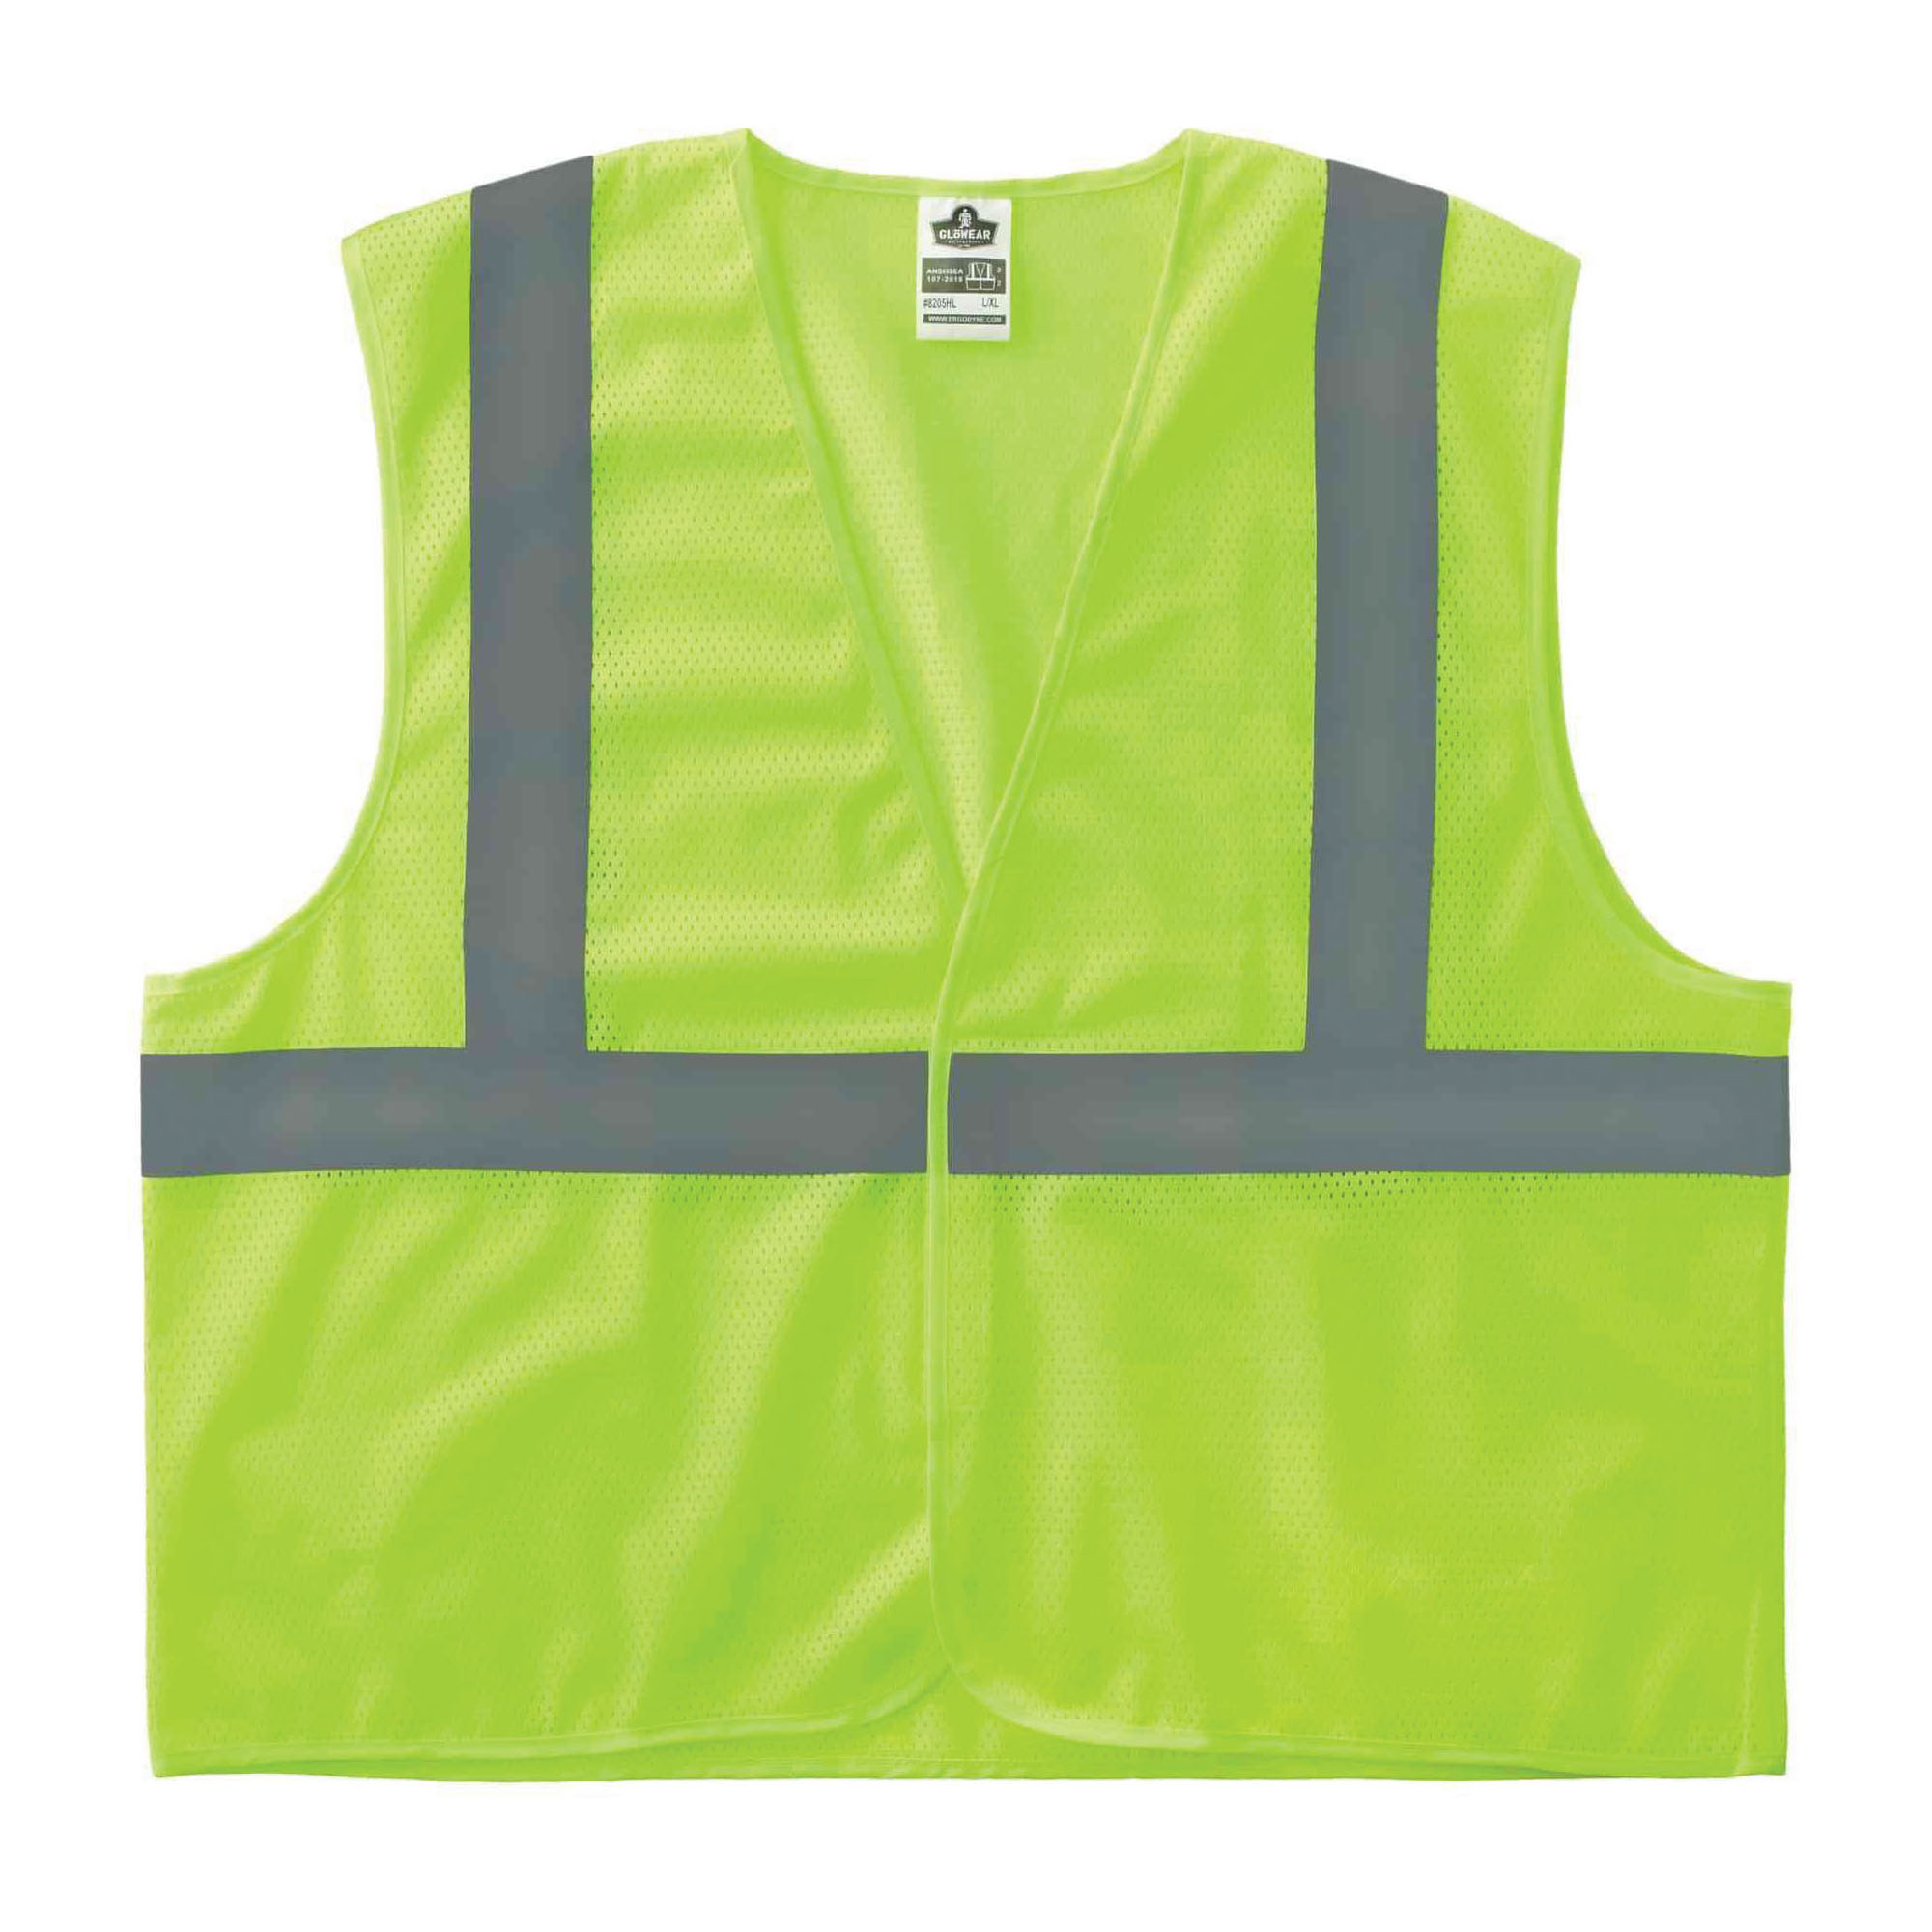 GloWear® 8205HL Super Econo Vest, Hi-Viz Orange, Polyester Mesh, Hook and Loop Closure, ANSI Class: Class 2, Specifications Met: ANSI/ISEA 107-2015 Type R, Lime or Orange, Various Sizes